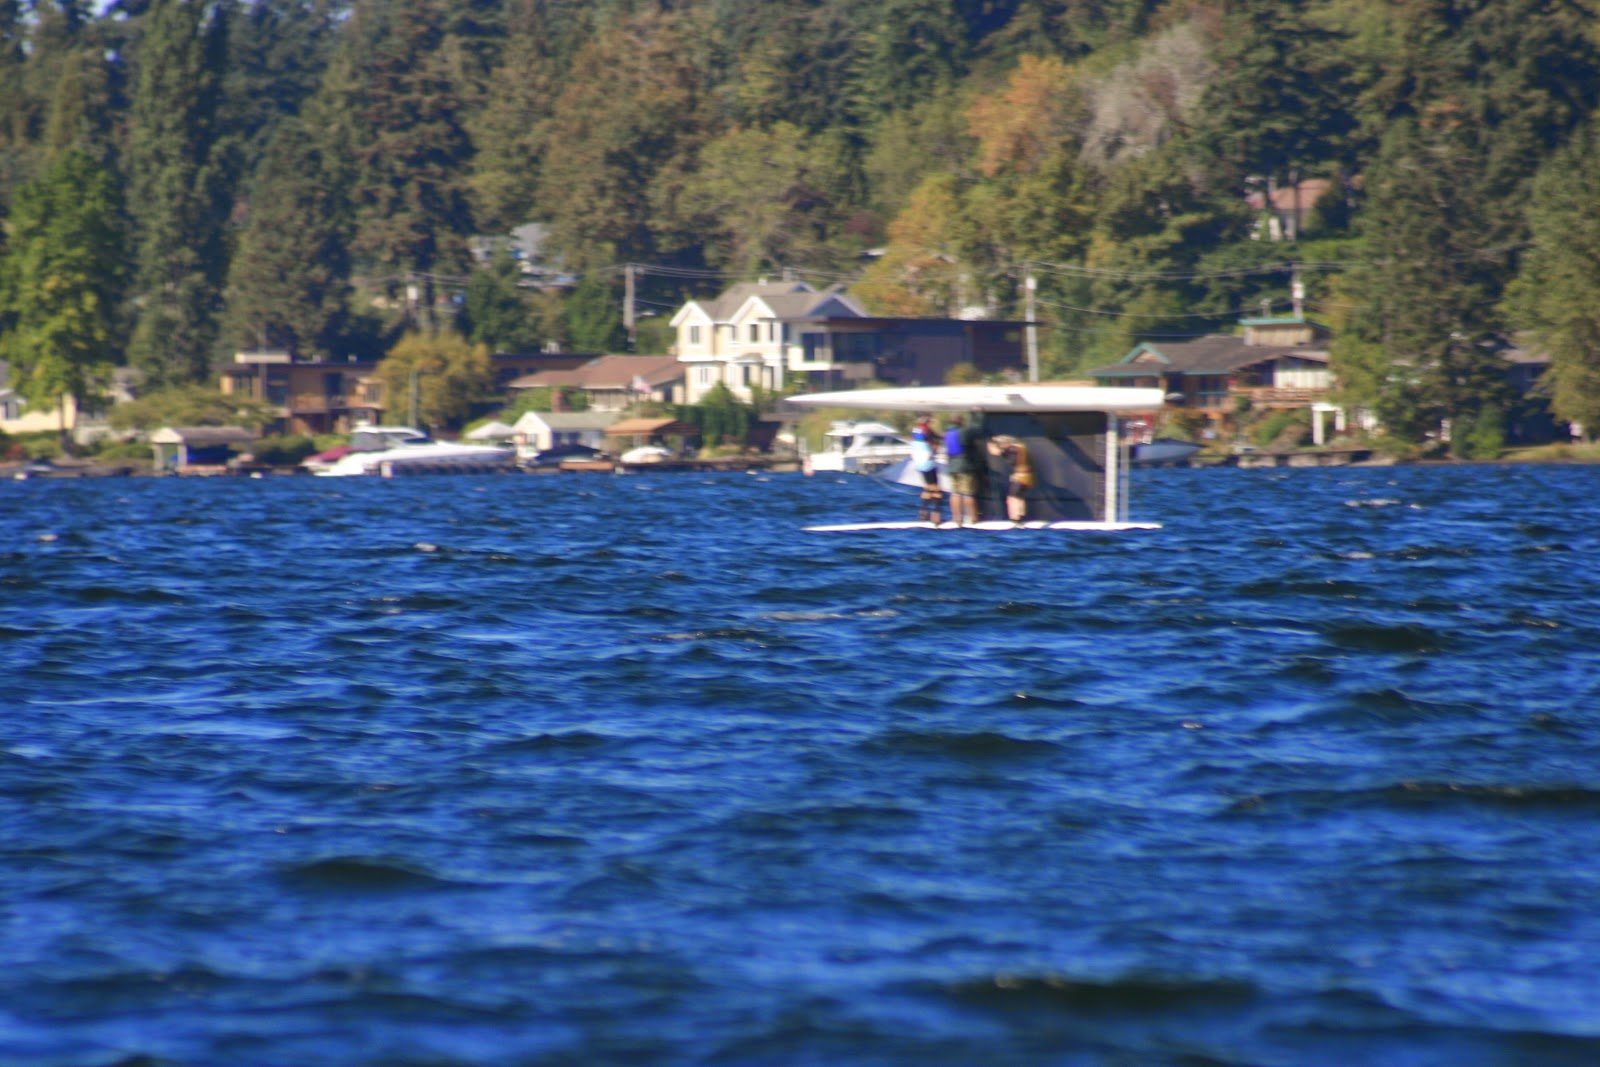 Righting a capsized hobie cat 1